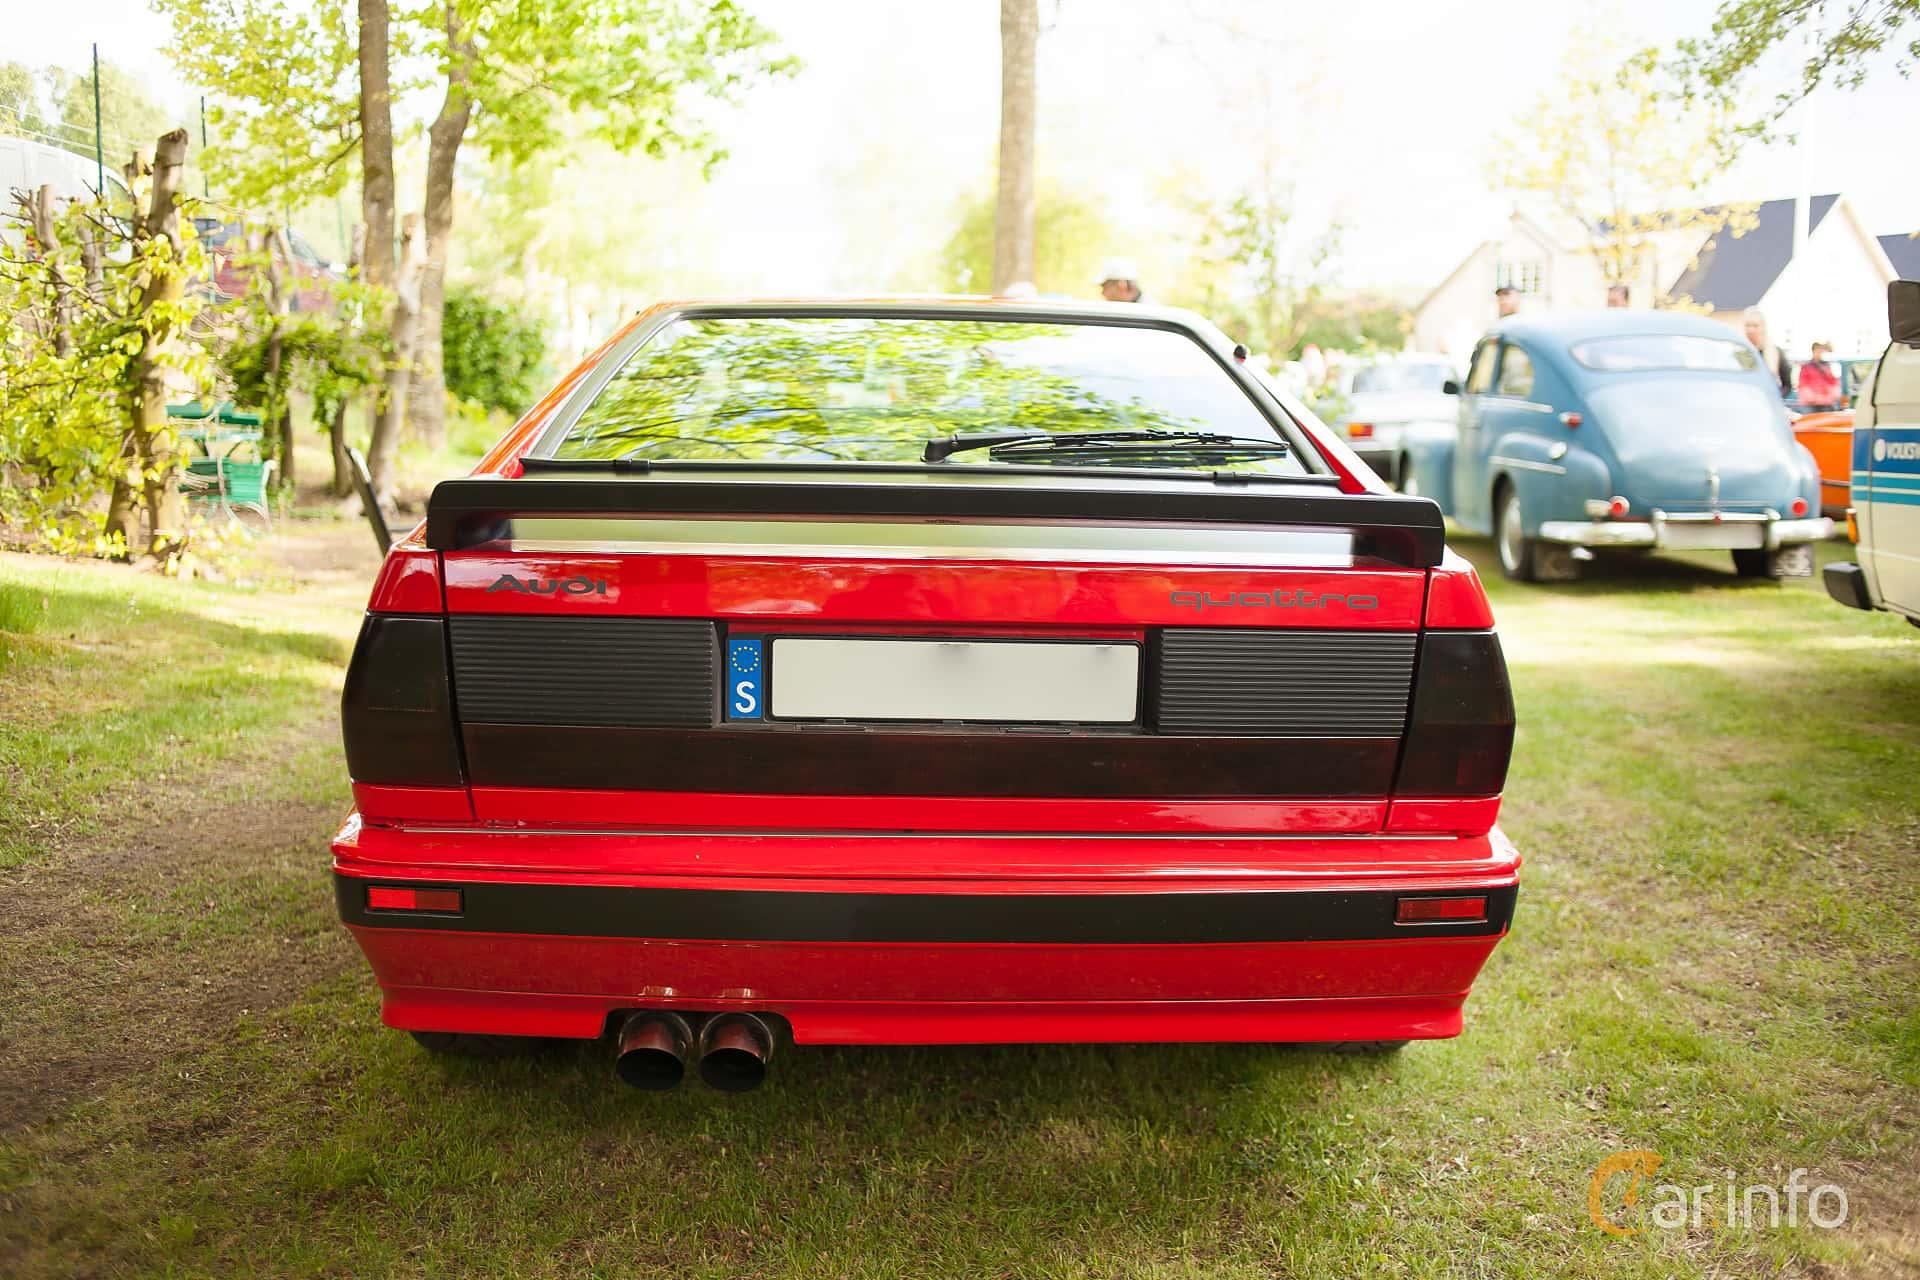 Audi quattro 2.1 quattro Manual, 200hp, 1983 at Billesholms Veteranbilsträff Maj / 2015